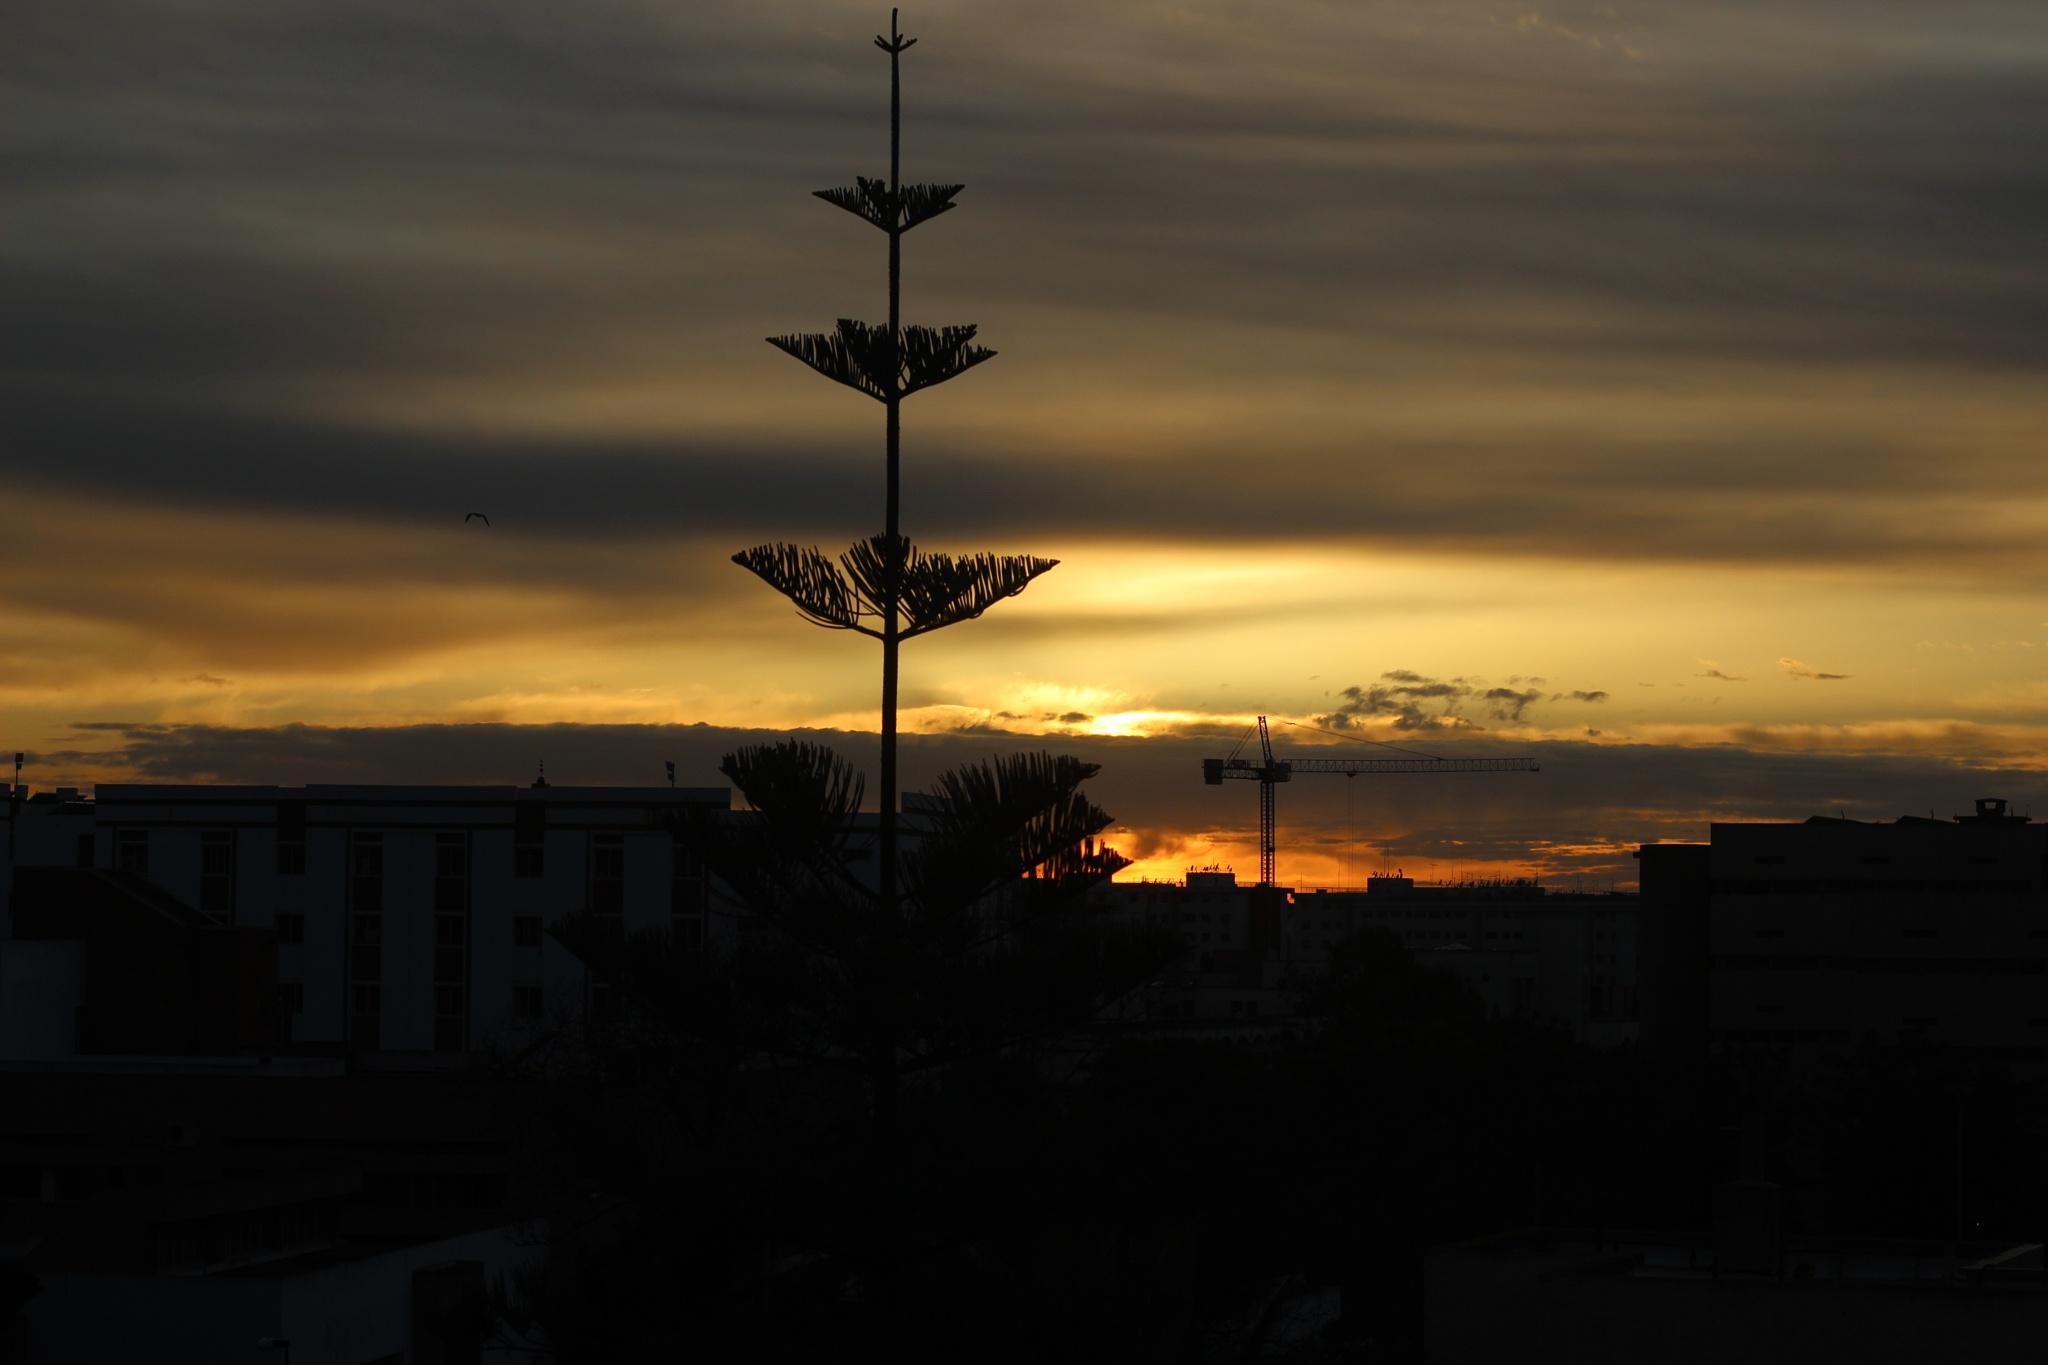 Gracious sunset by Soukaina